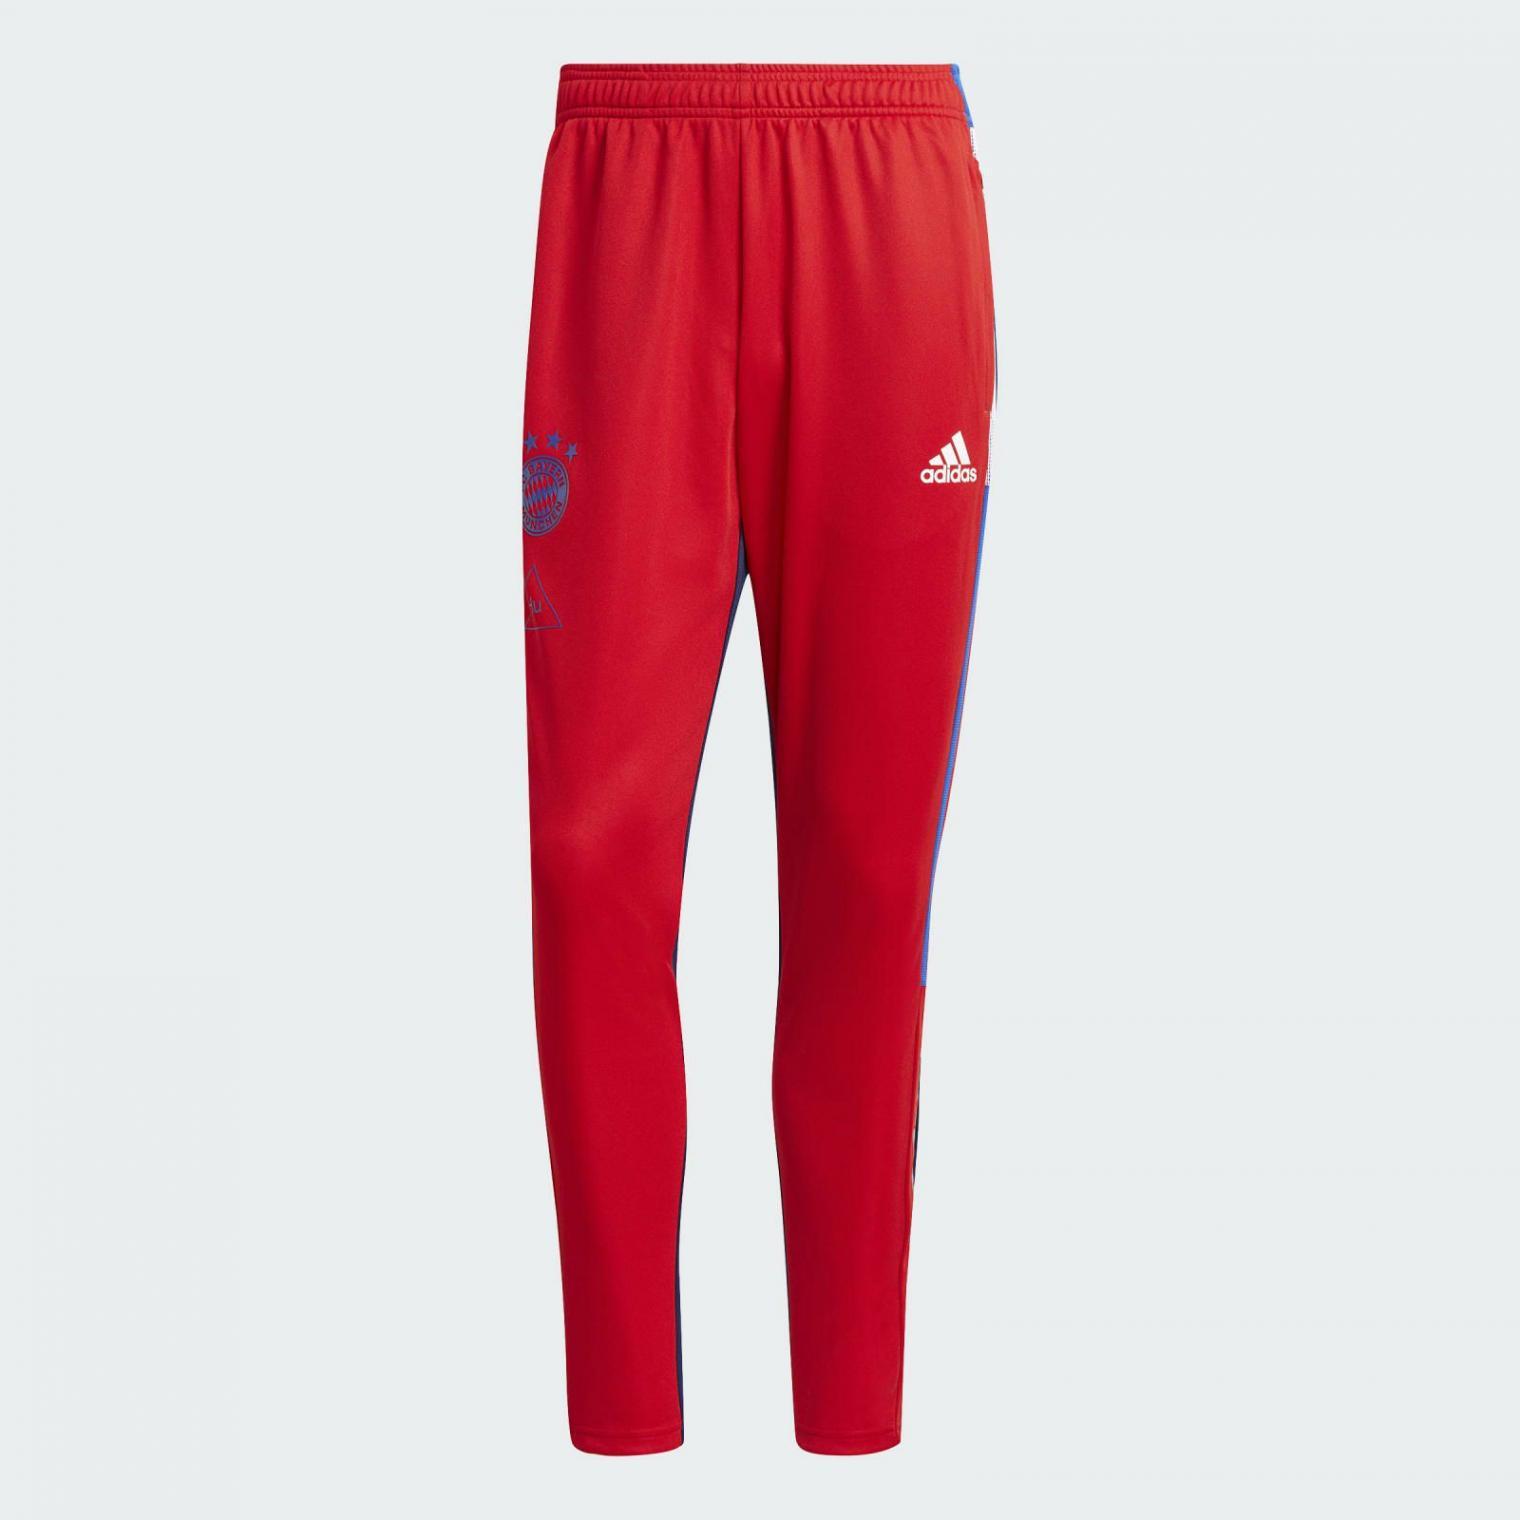 Pantalon Entrenamiento Fc Bayern Human Race Fcb True Red Dark Blue Pantalones Adidas Hombre Starline Magicians